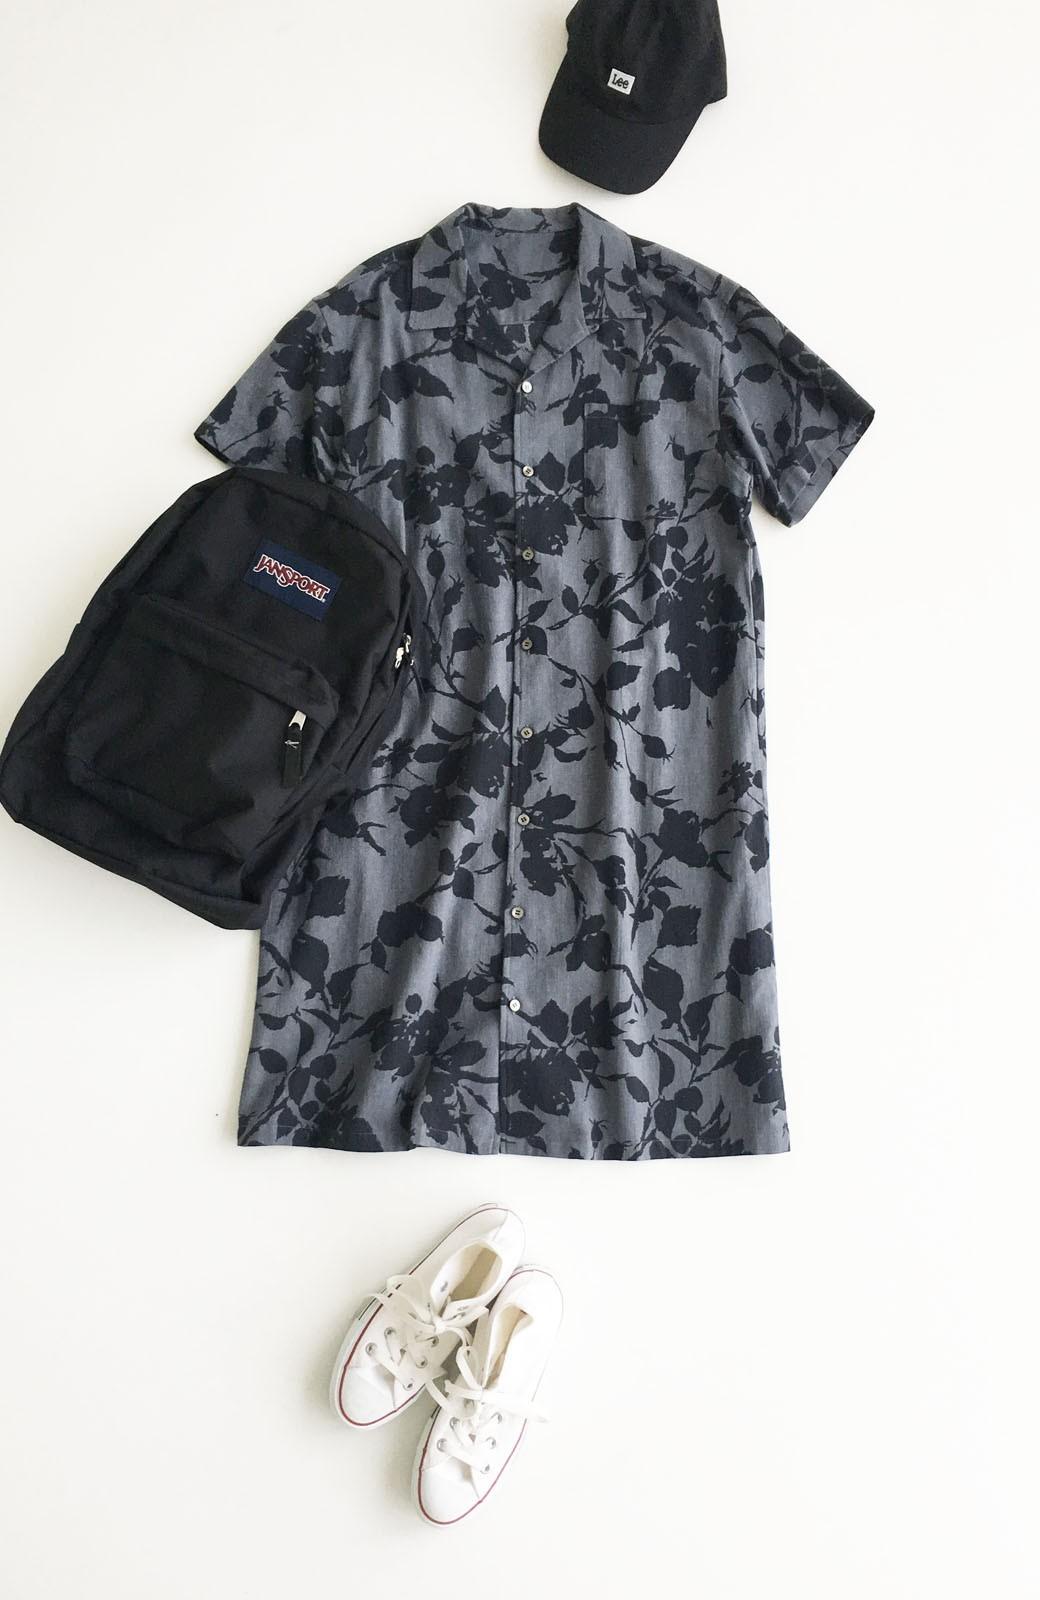 haco! 【コラボ3年目!】京都の浴衣屋さんと作った浴衣生地のシャツワンピース <グレー系その他>の商品写真9